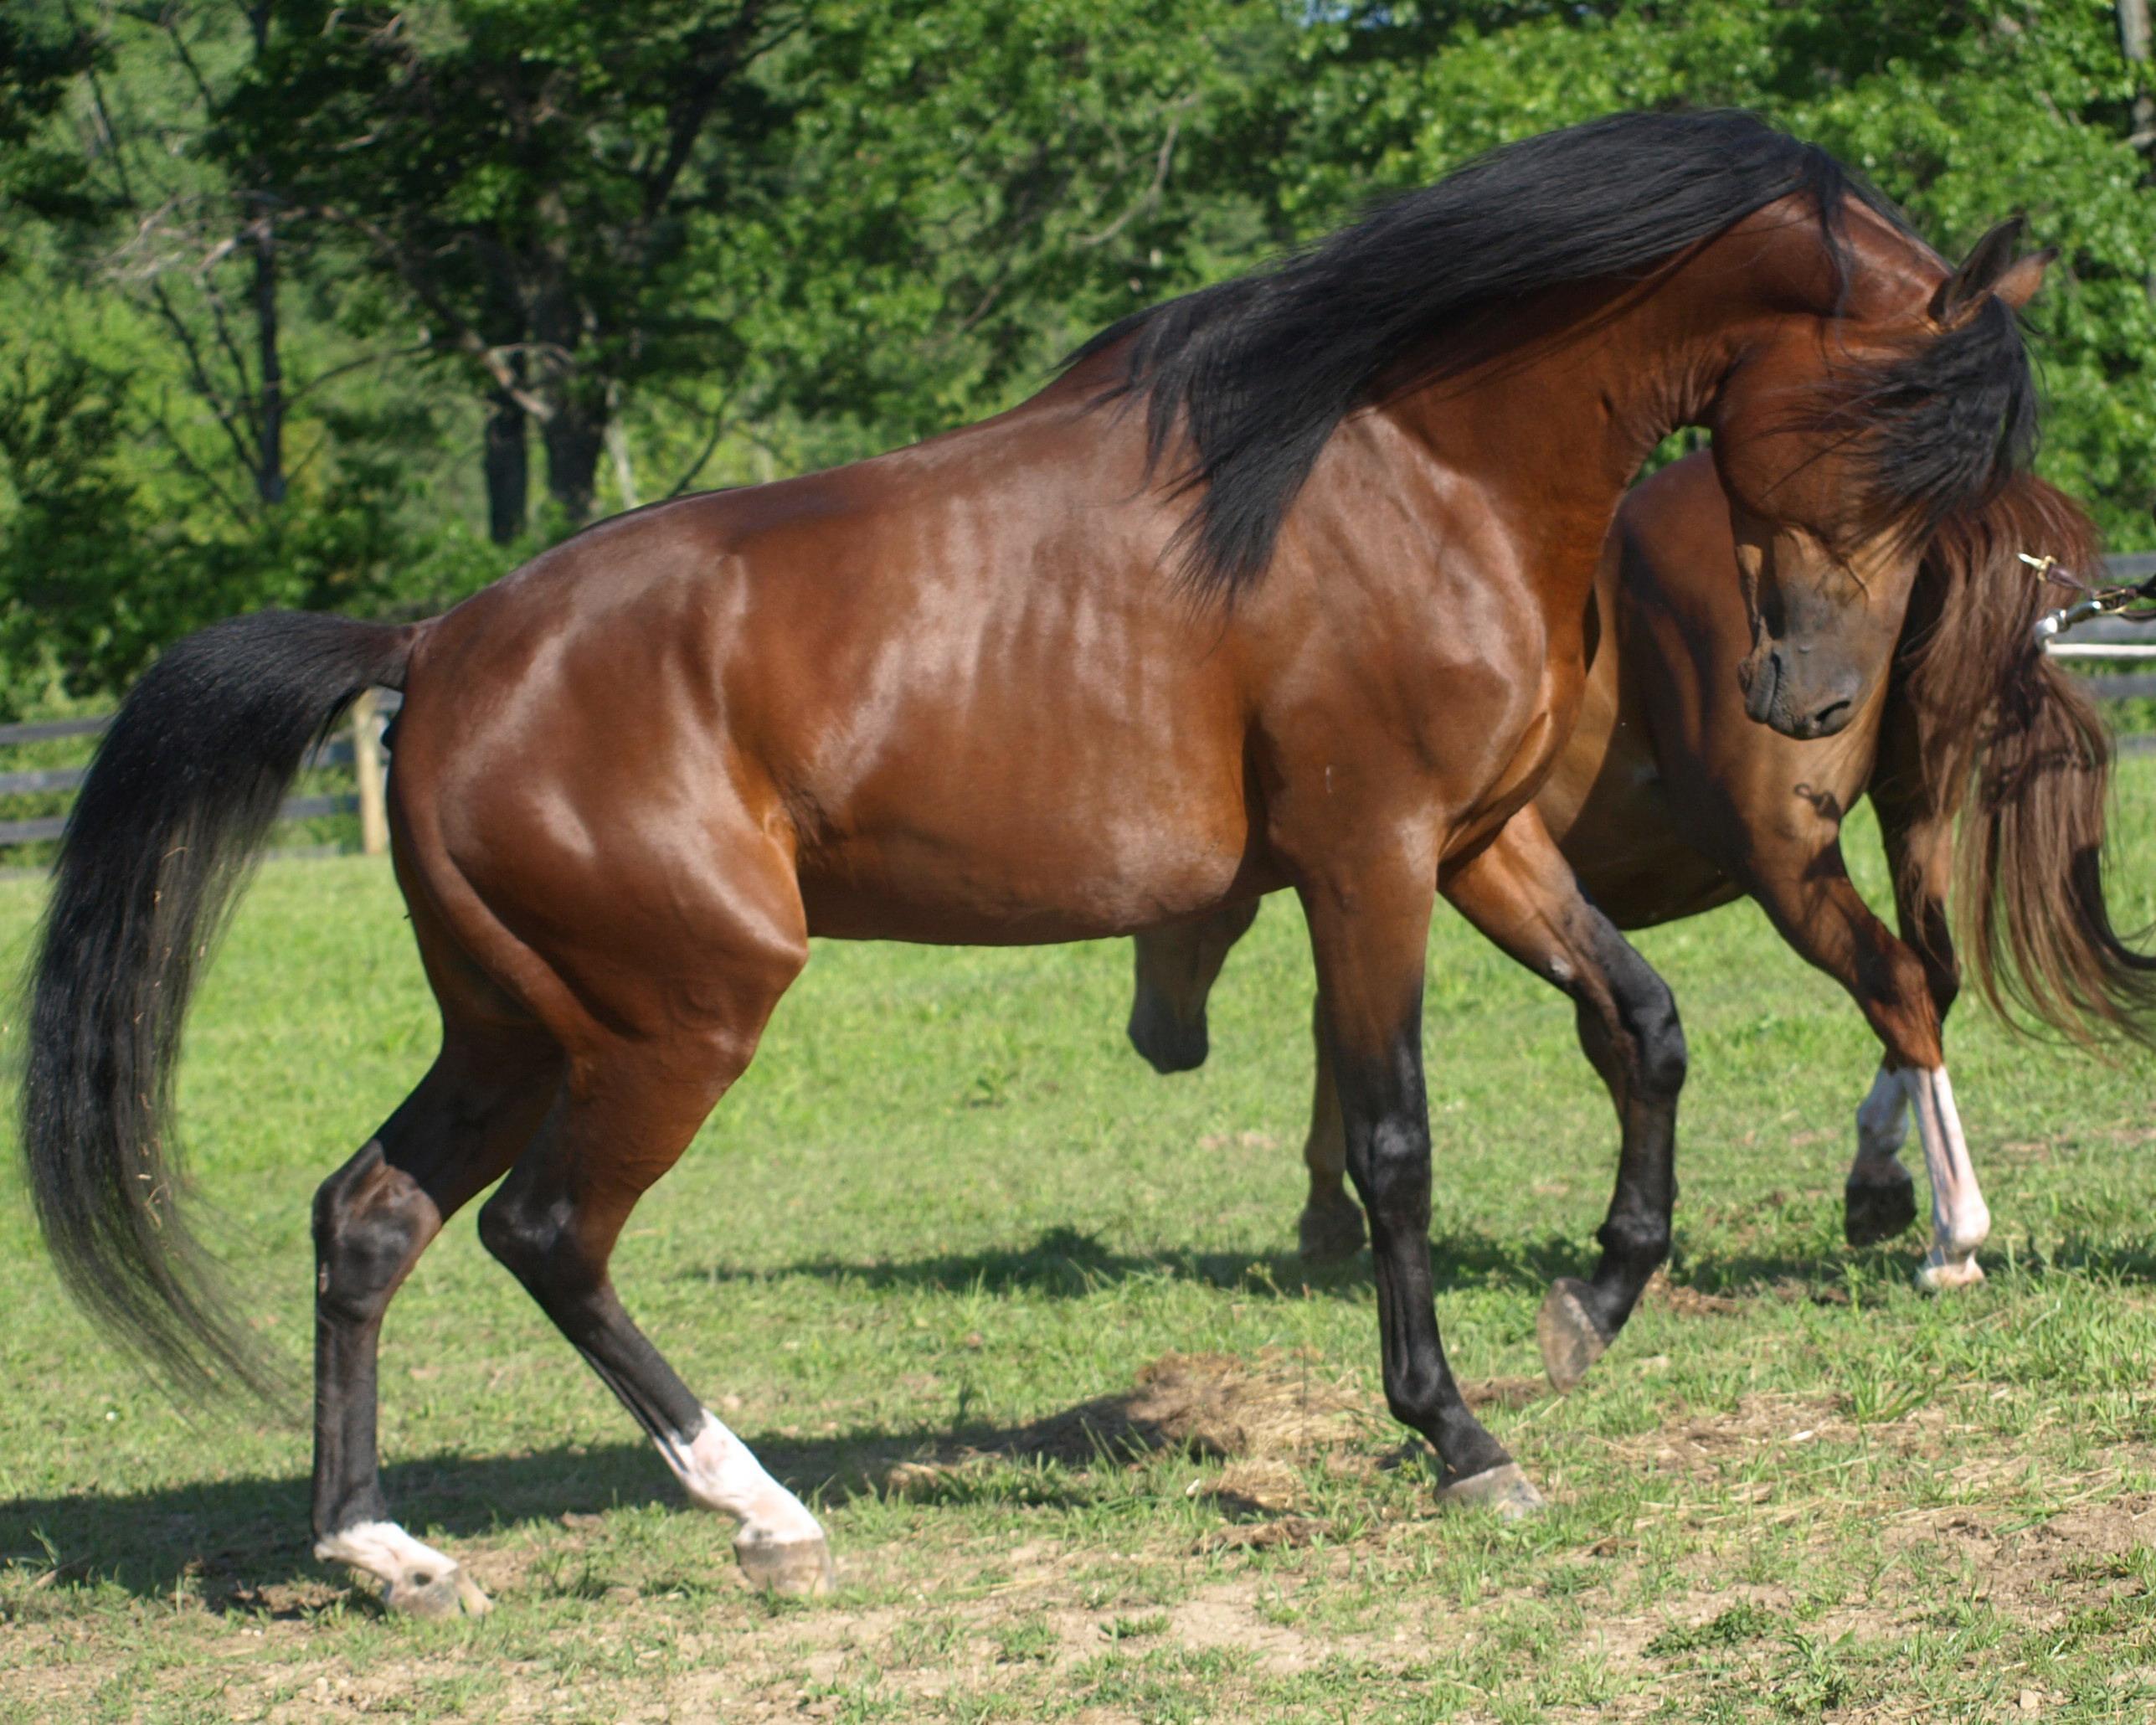 Arabian horse images